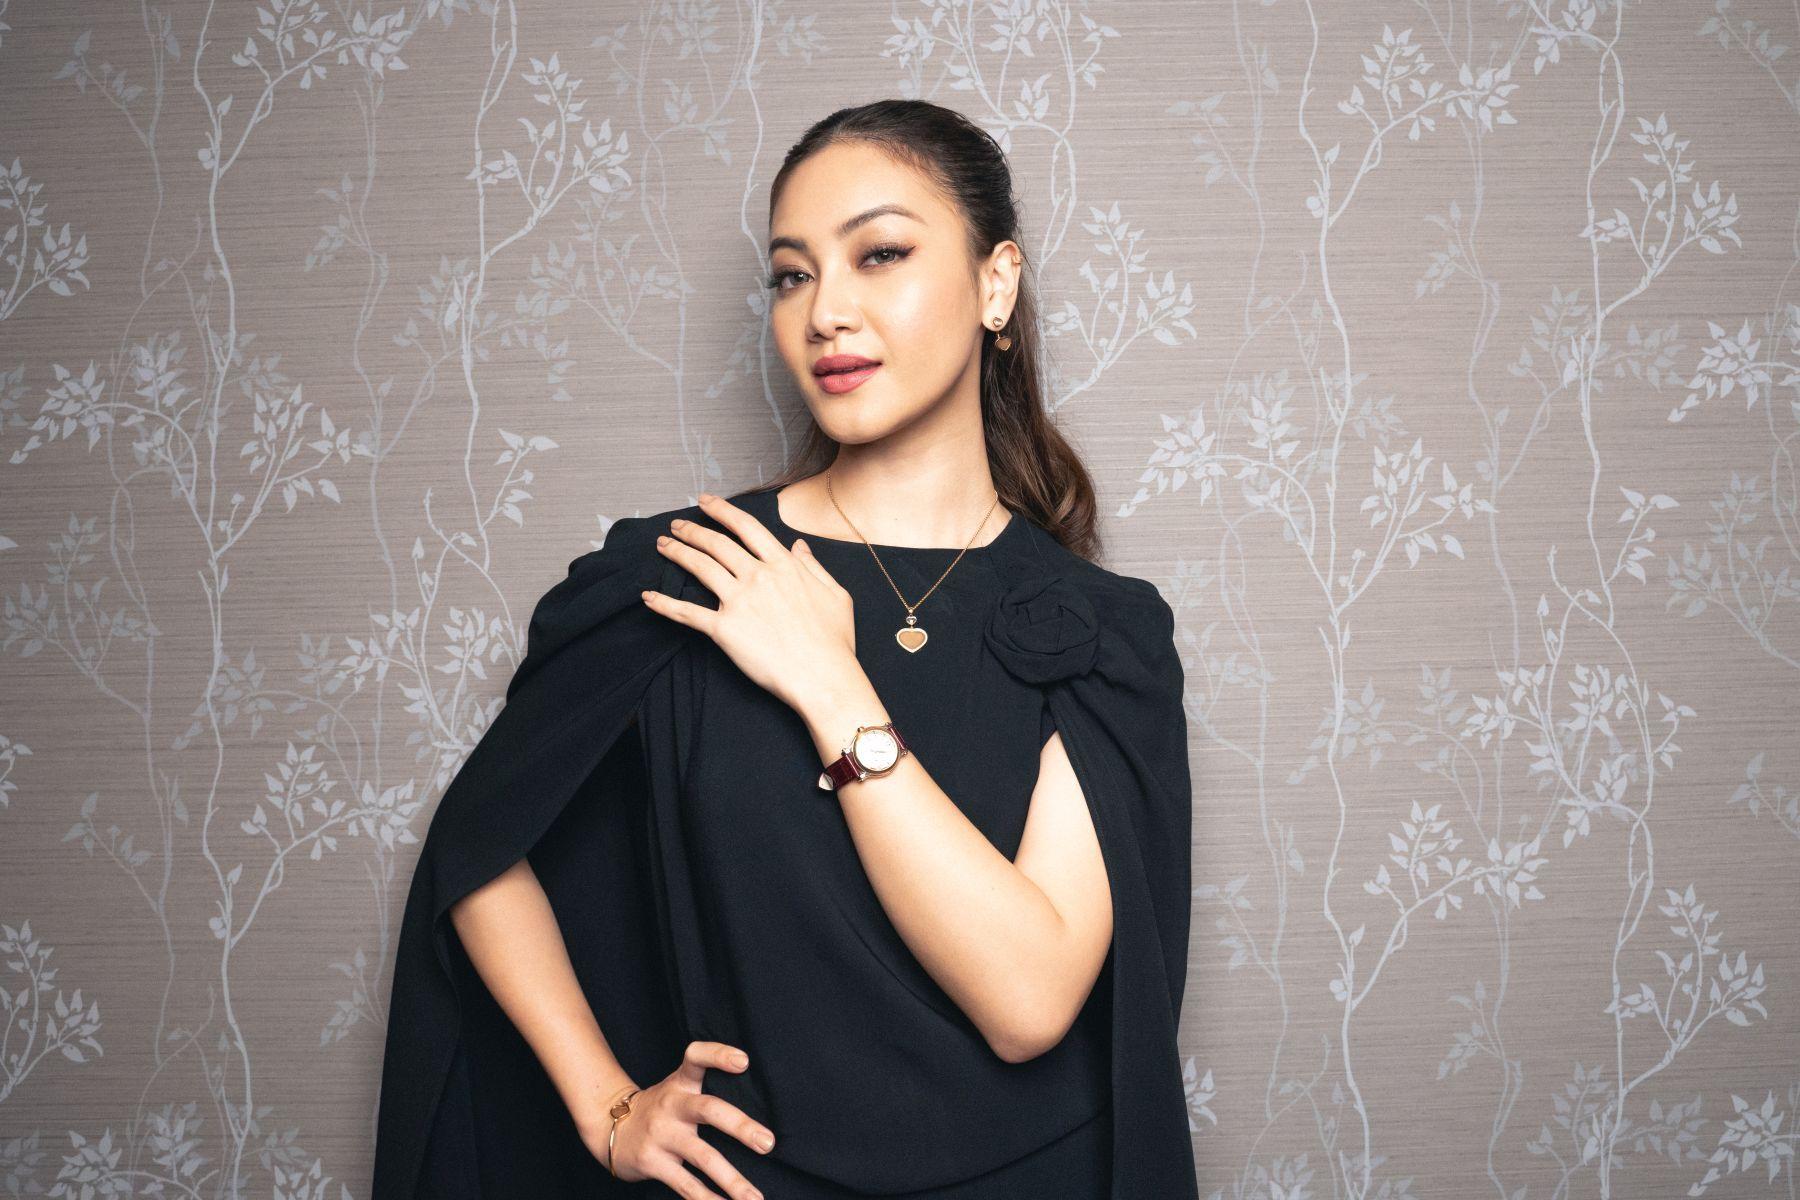 Daiyan Trisha with Chopard Happy Sport watch with dancing diamond and heart on alligator strap